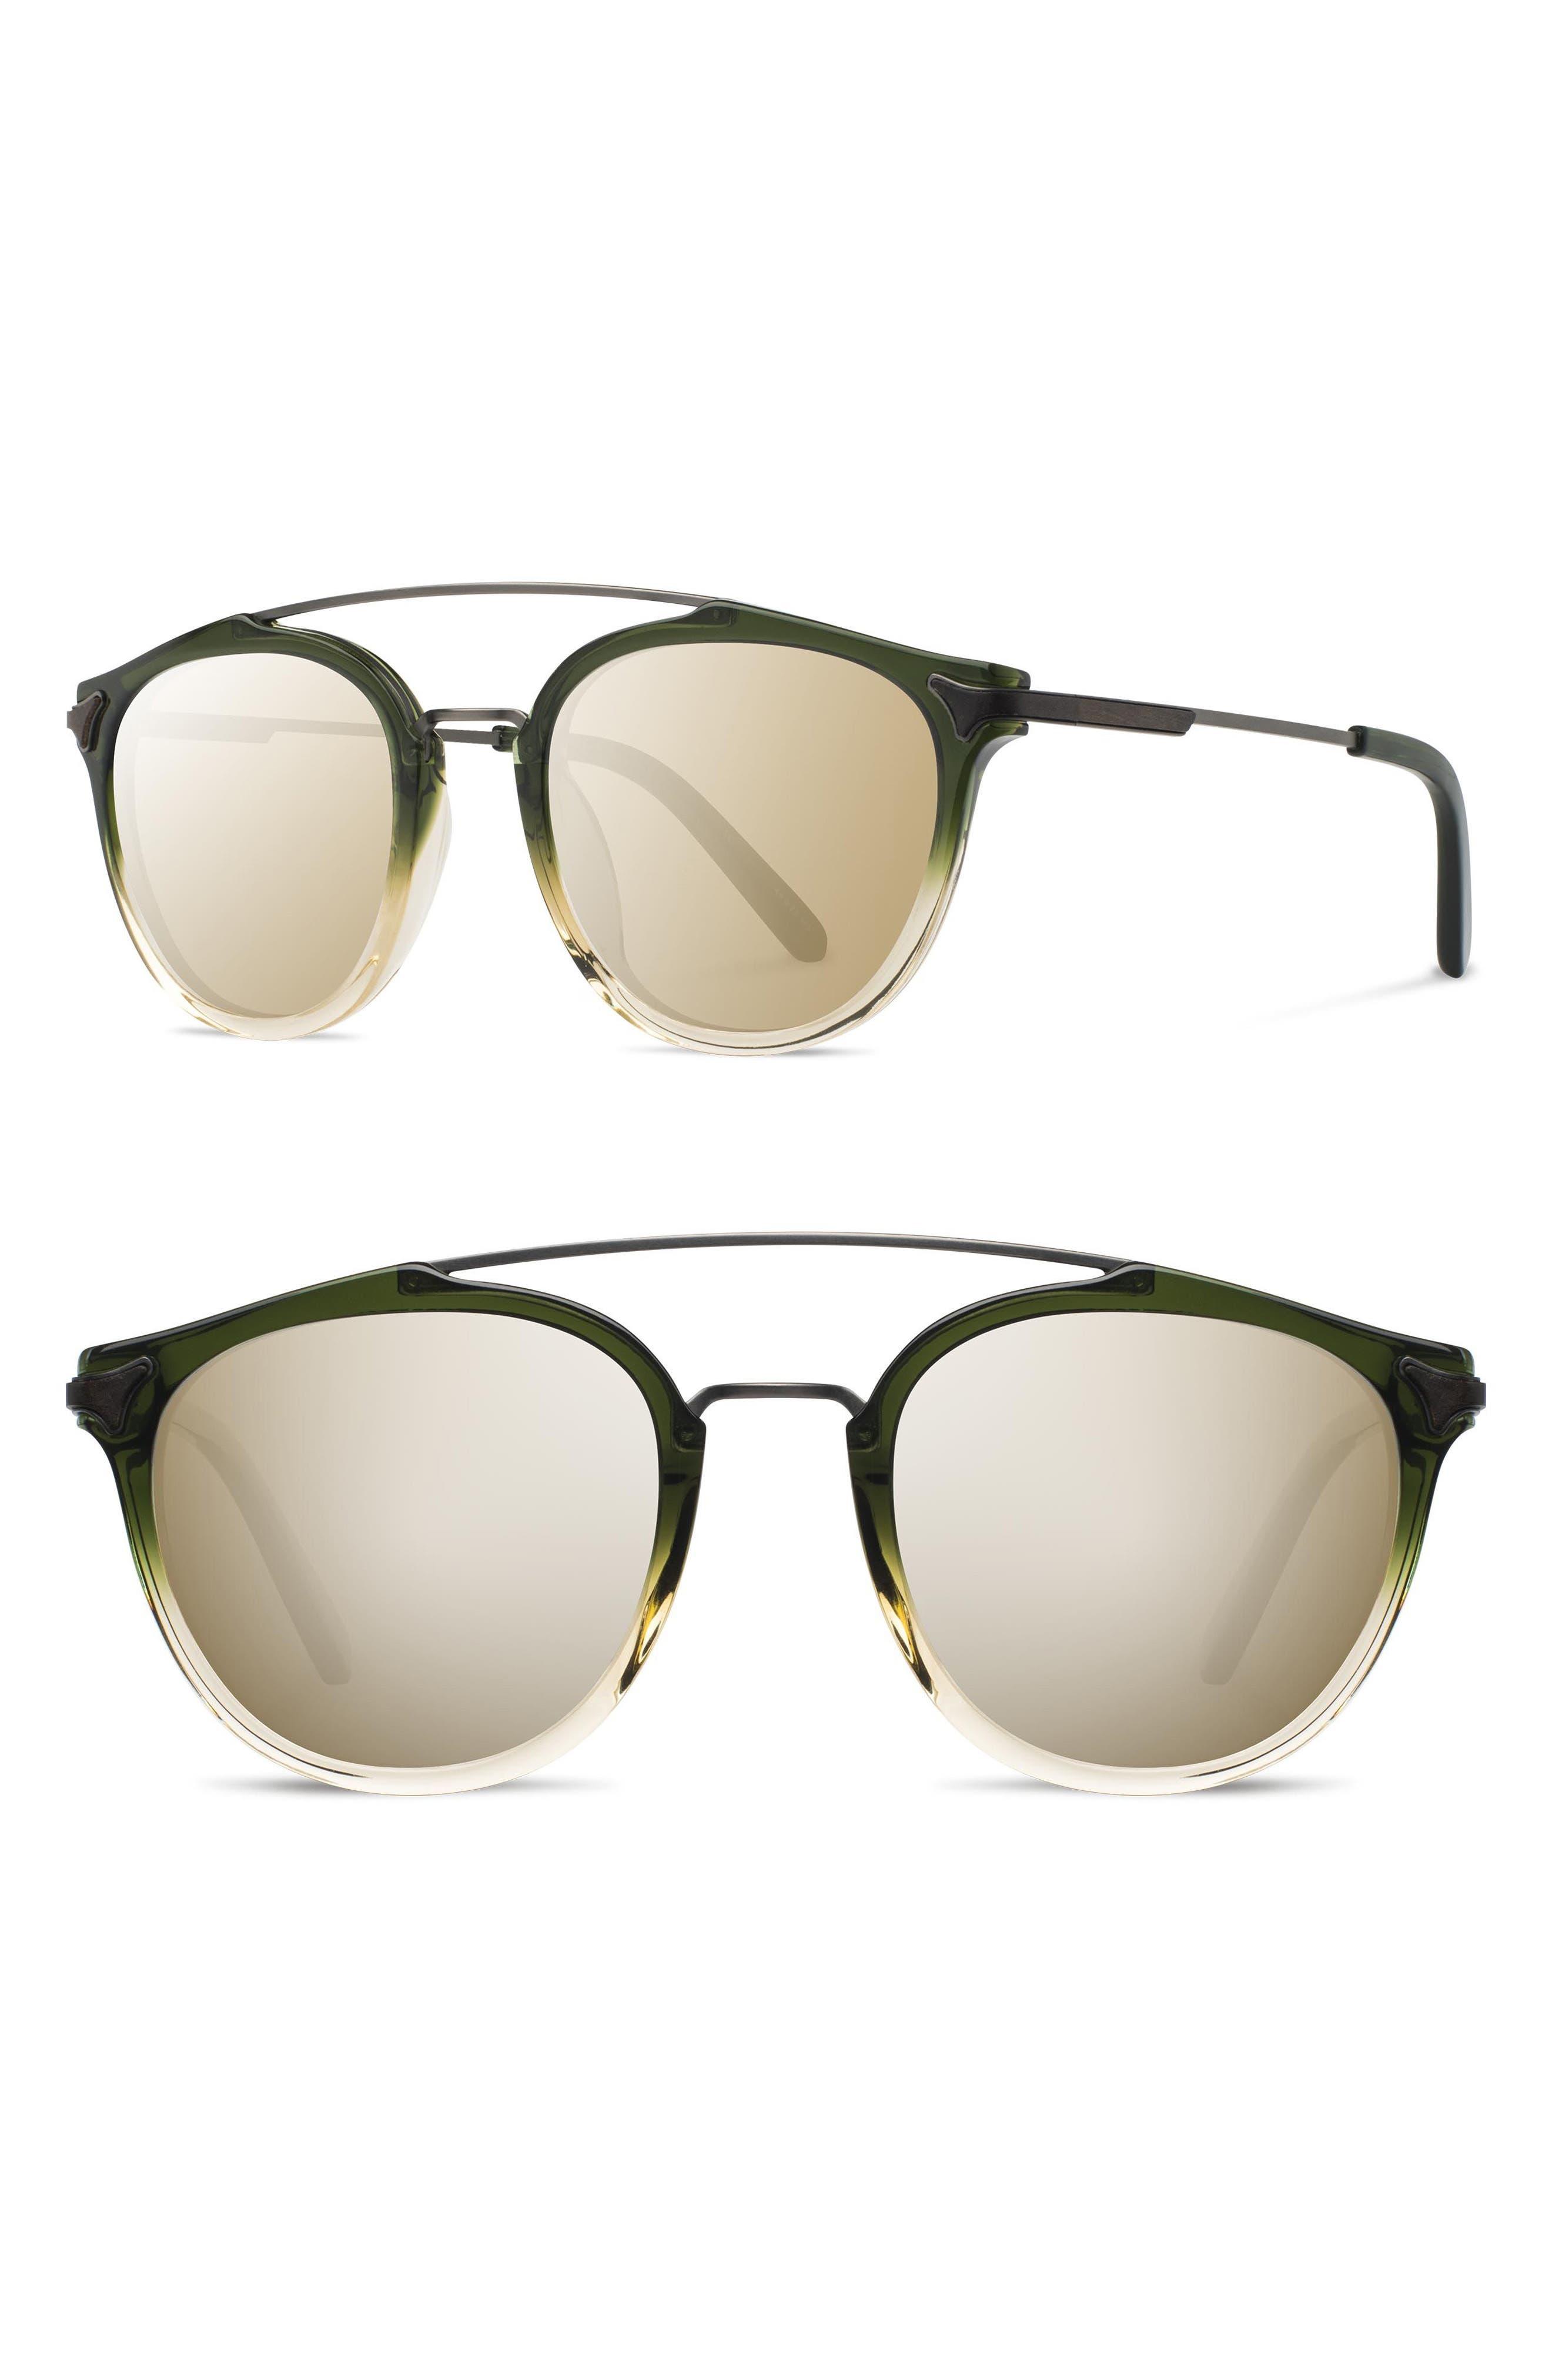 Shwood Kinsrow 4m Acetate & Wood Sunglasses - Mojito/ Gold Mirror